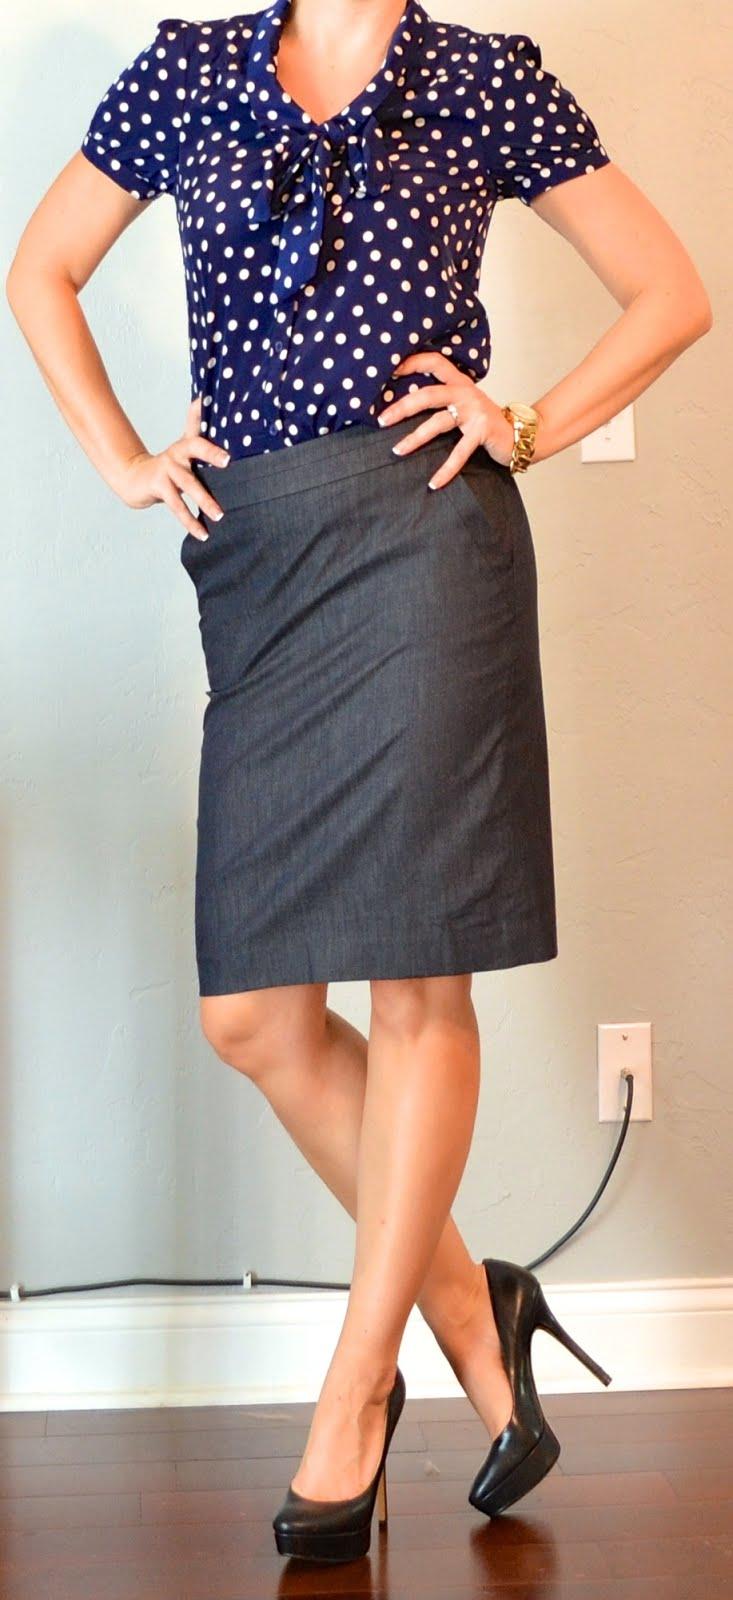 outfit post: polka-dot blouse, denim pencil skirt